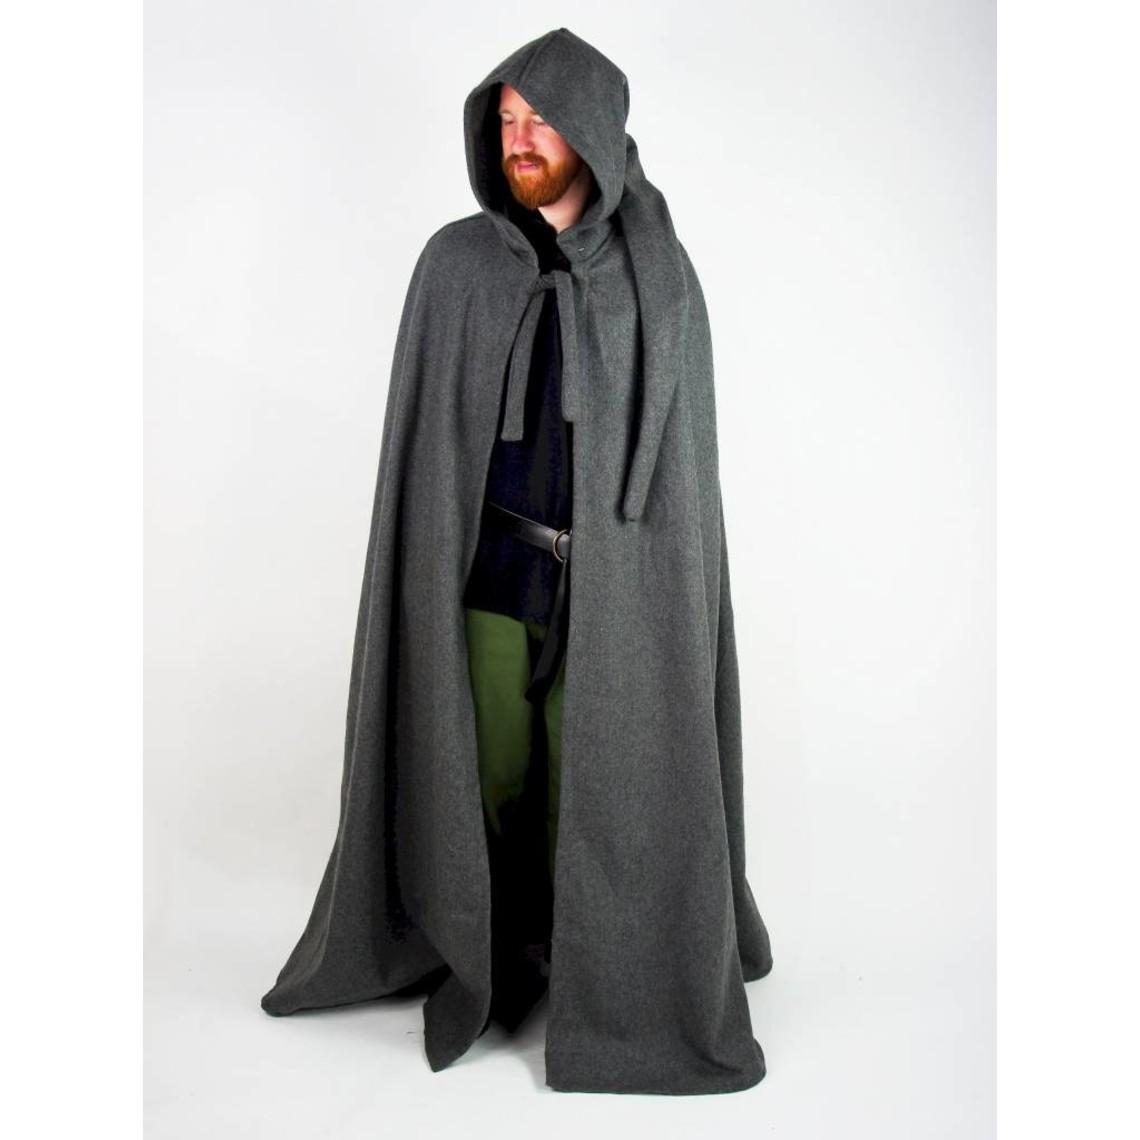 Leonardo Carbone Cape médiévale à capuche, verte